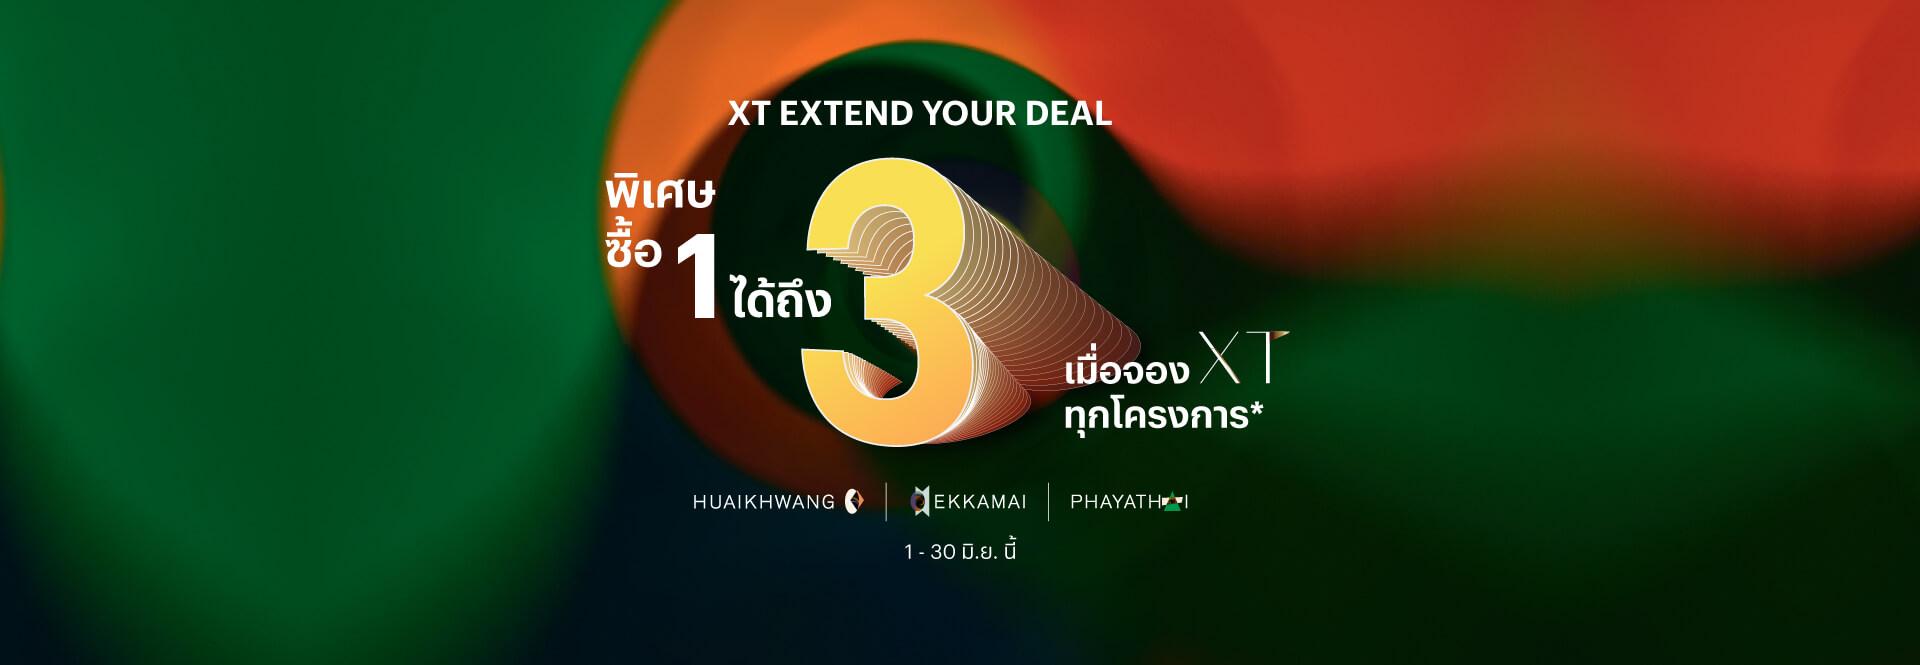 XT Deal Campaign